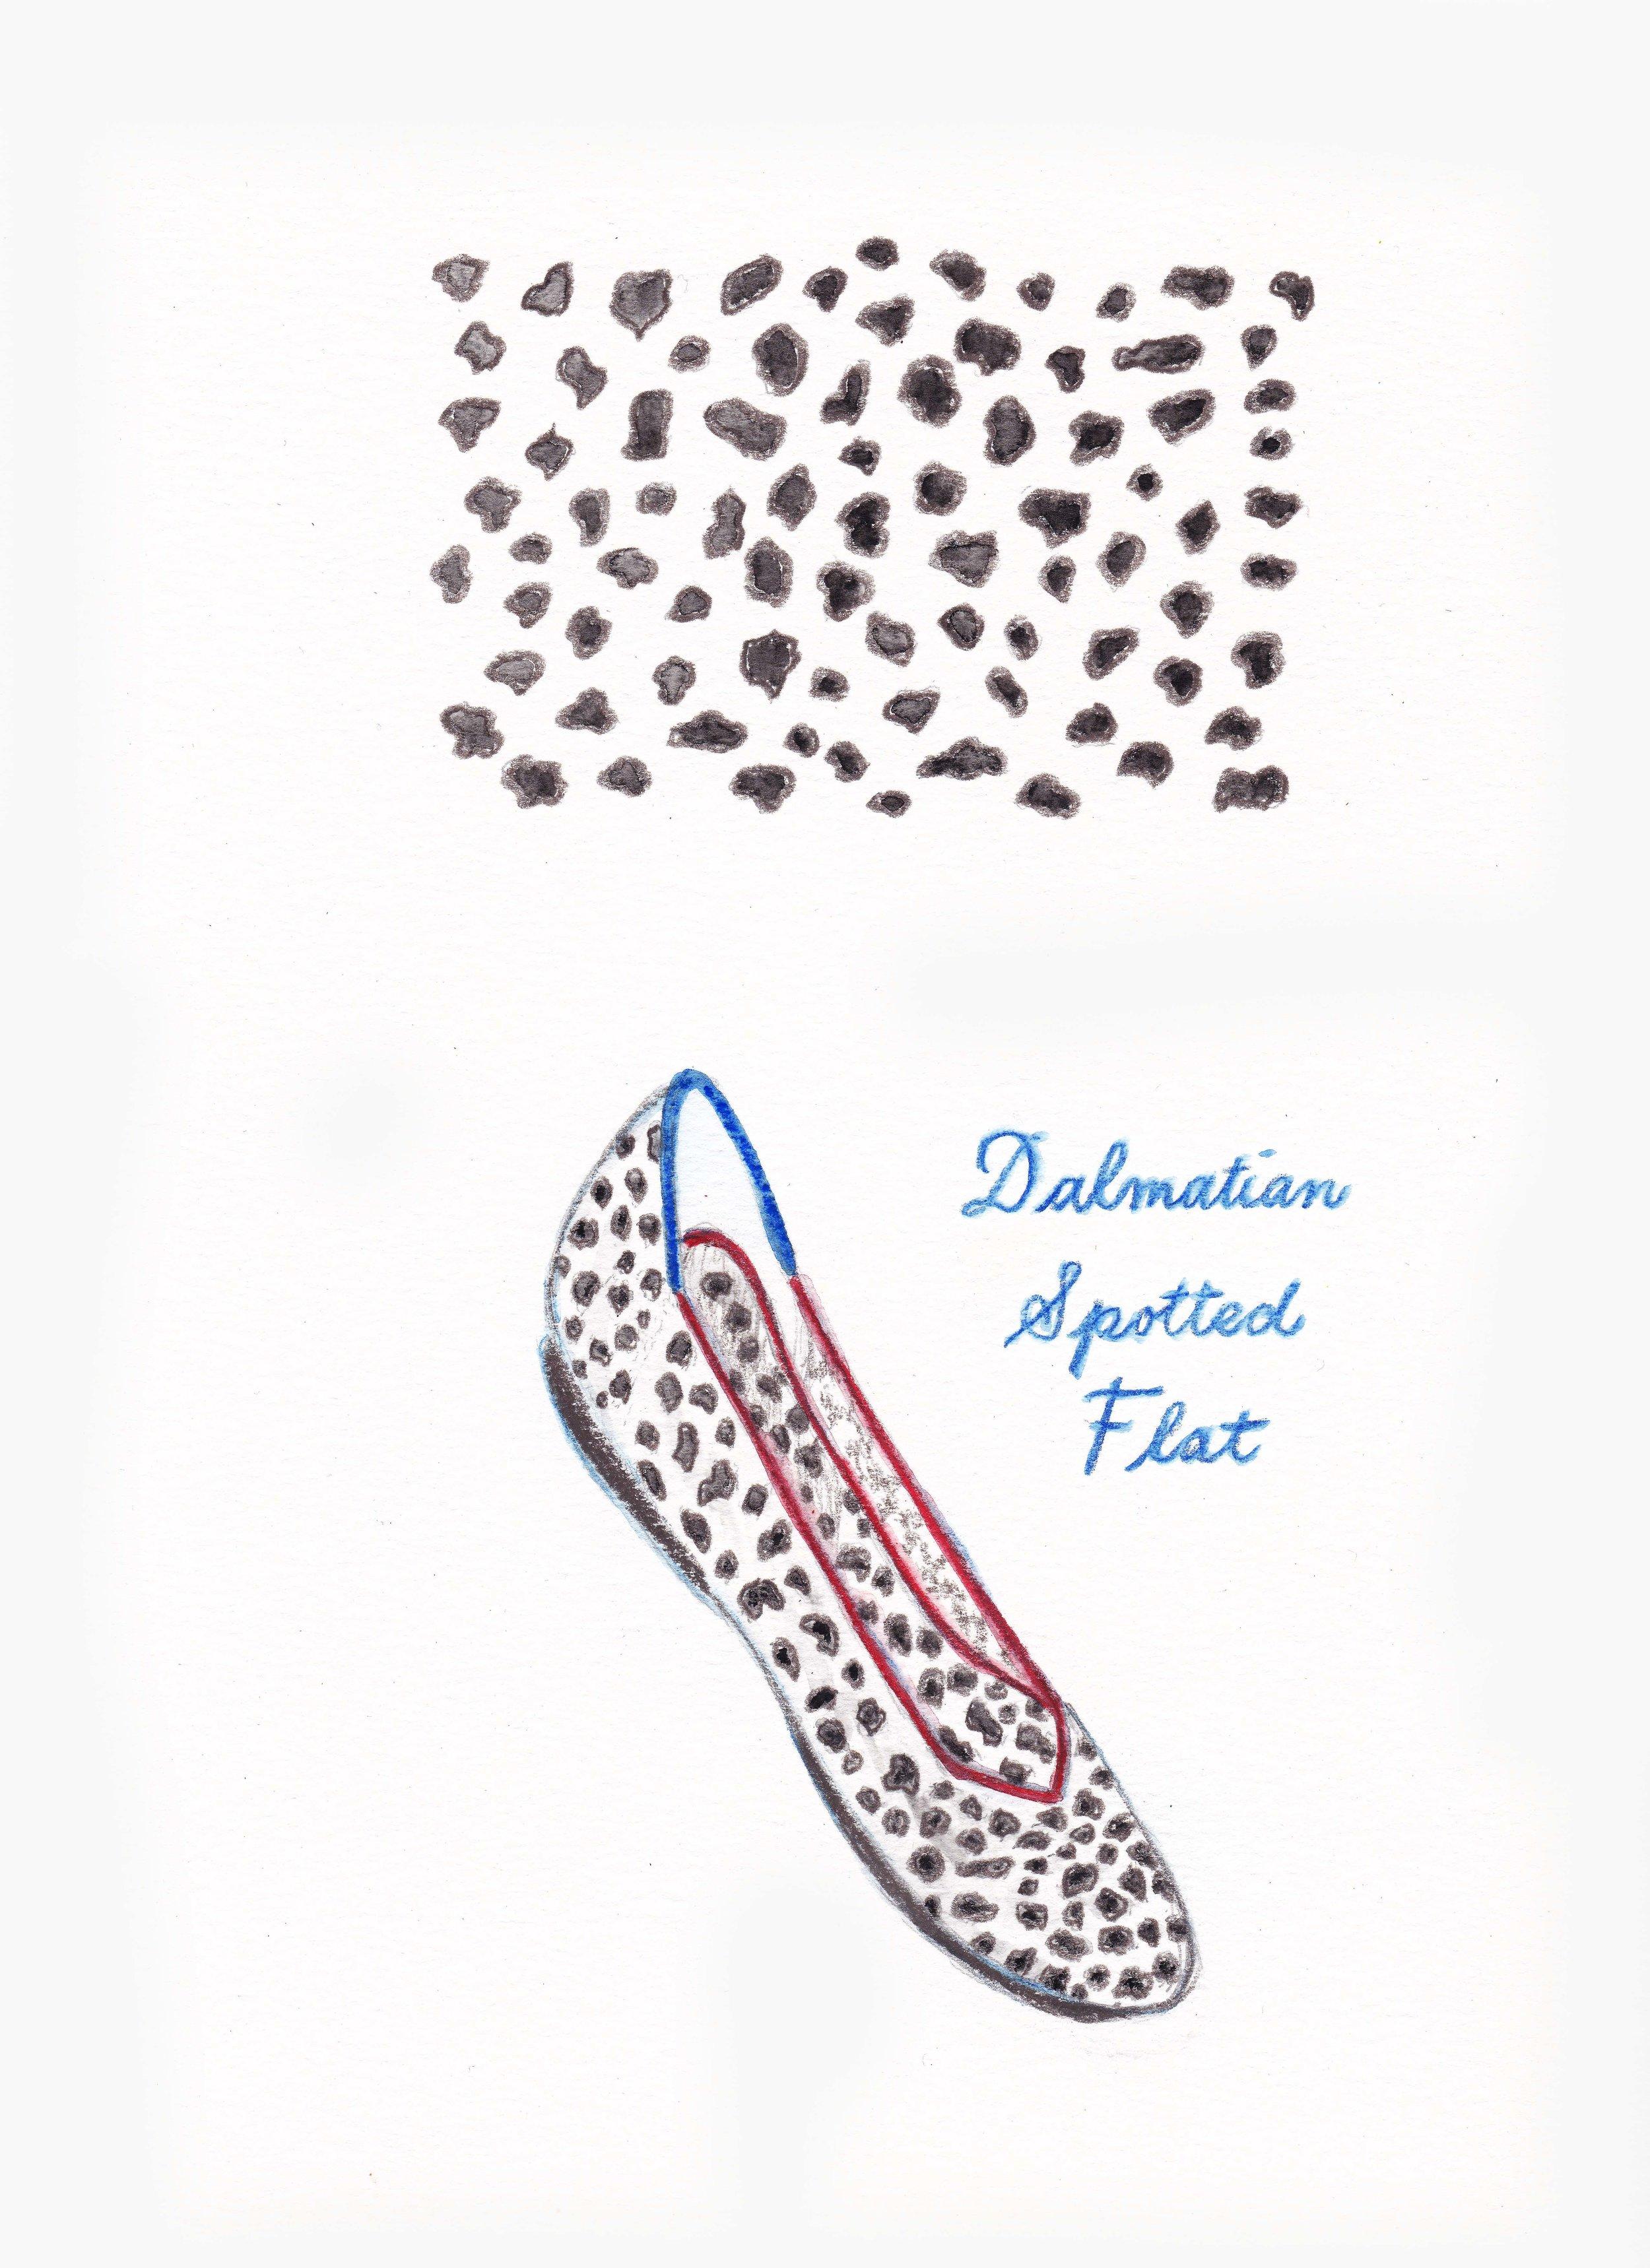 Laura Ann_Rothys_Dalmatian Spotted Flat.jpg